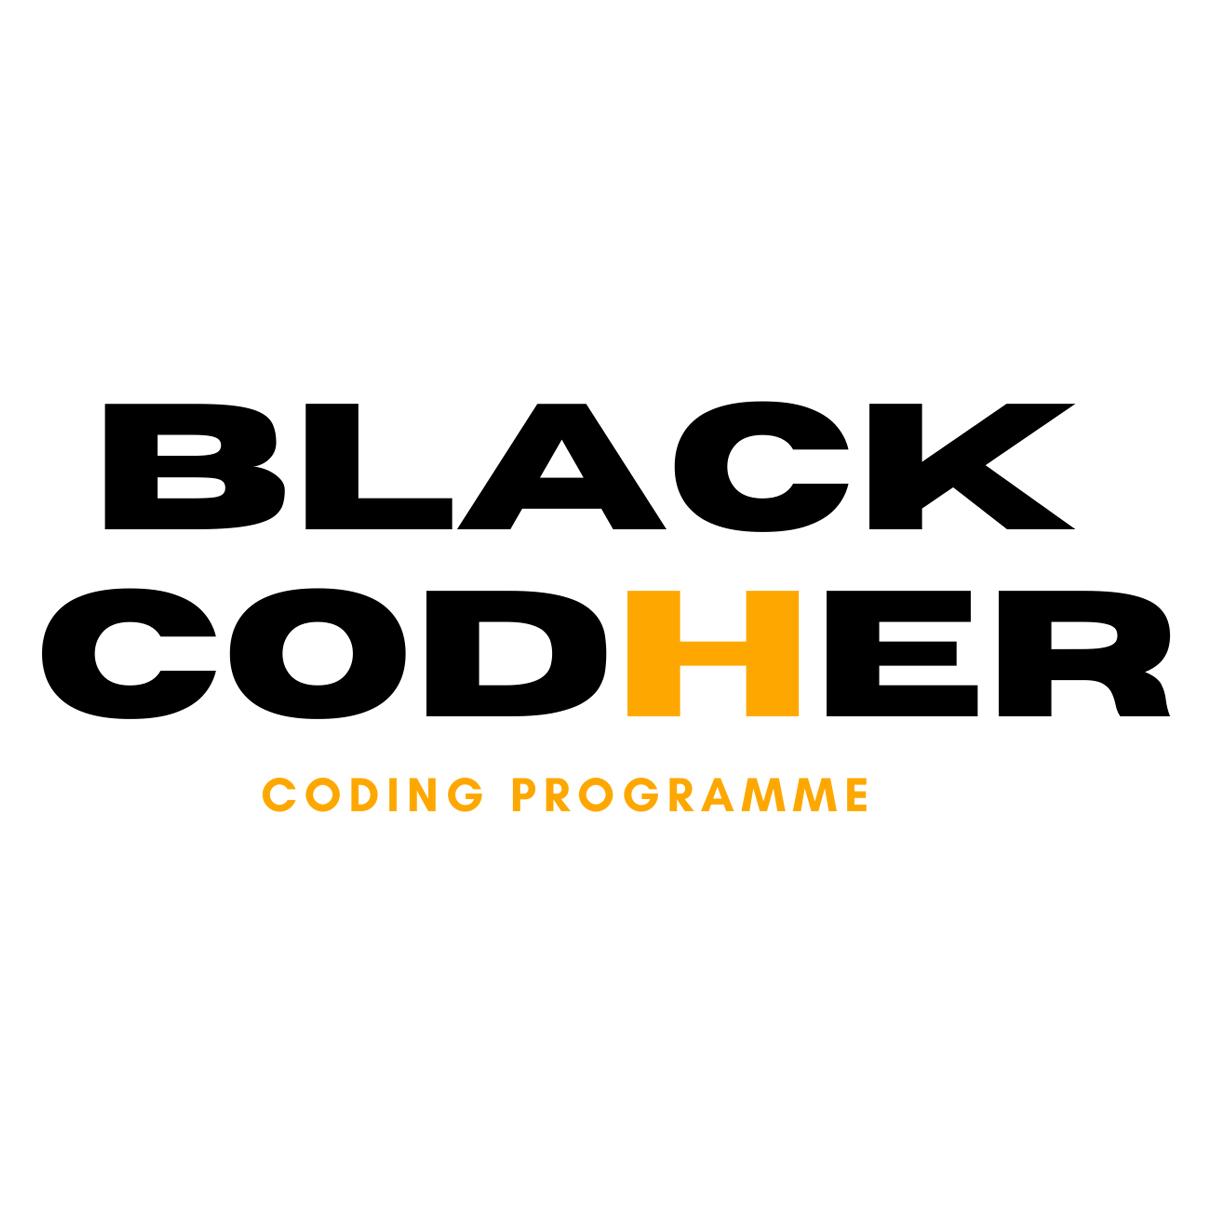 Black Codher logo